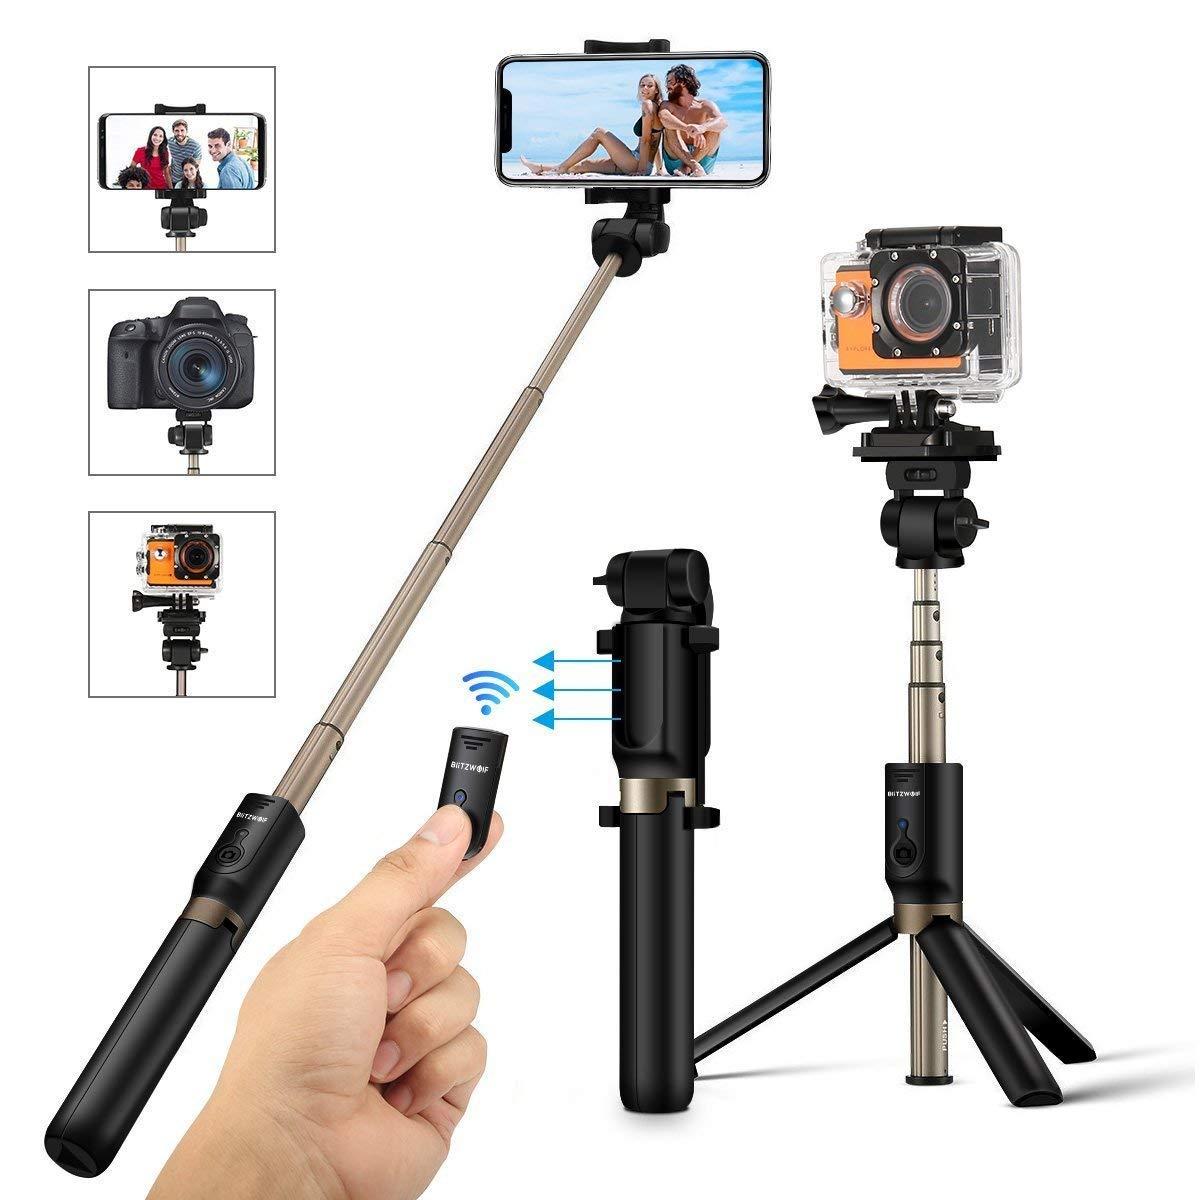 BlitzWolf selfie stick tripod with Bluetooth remote